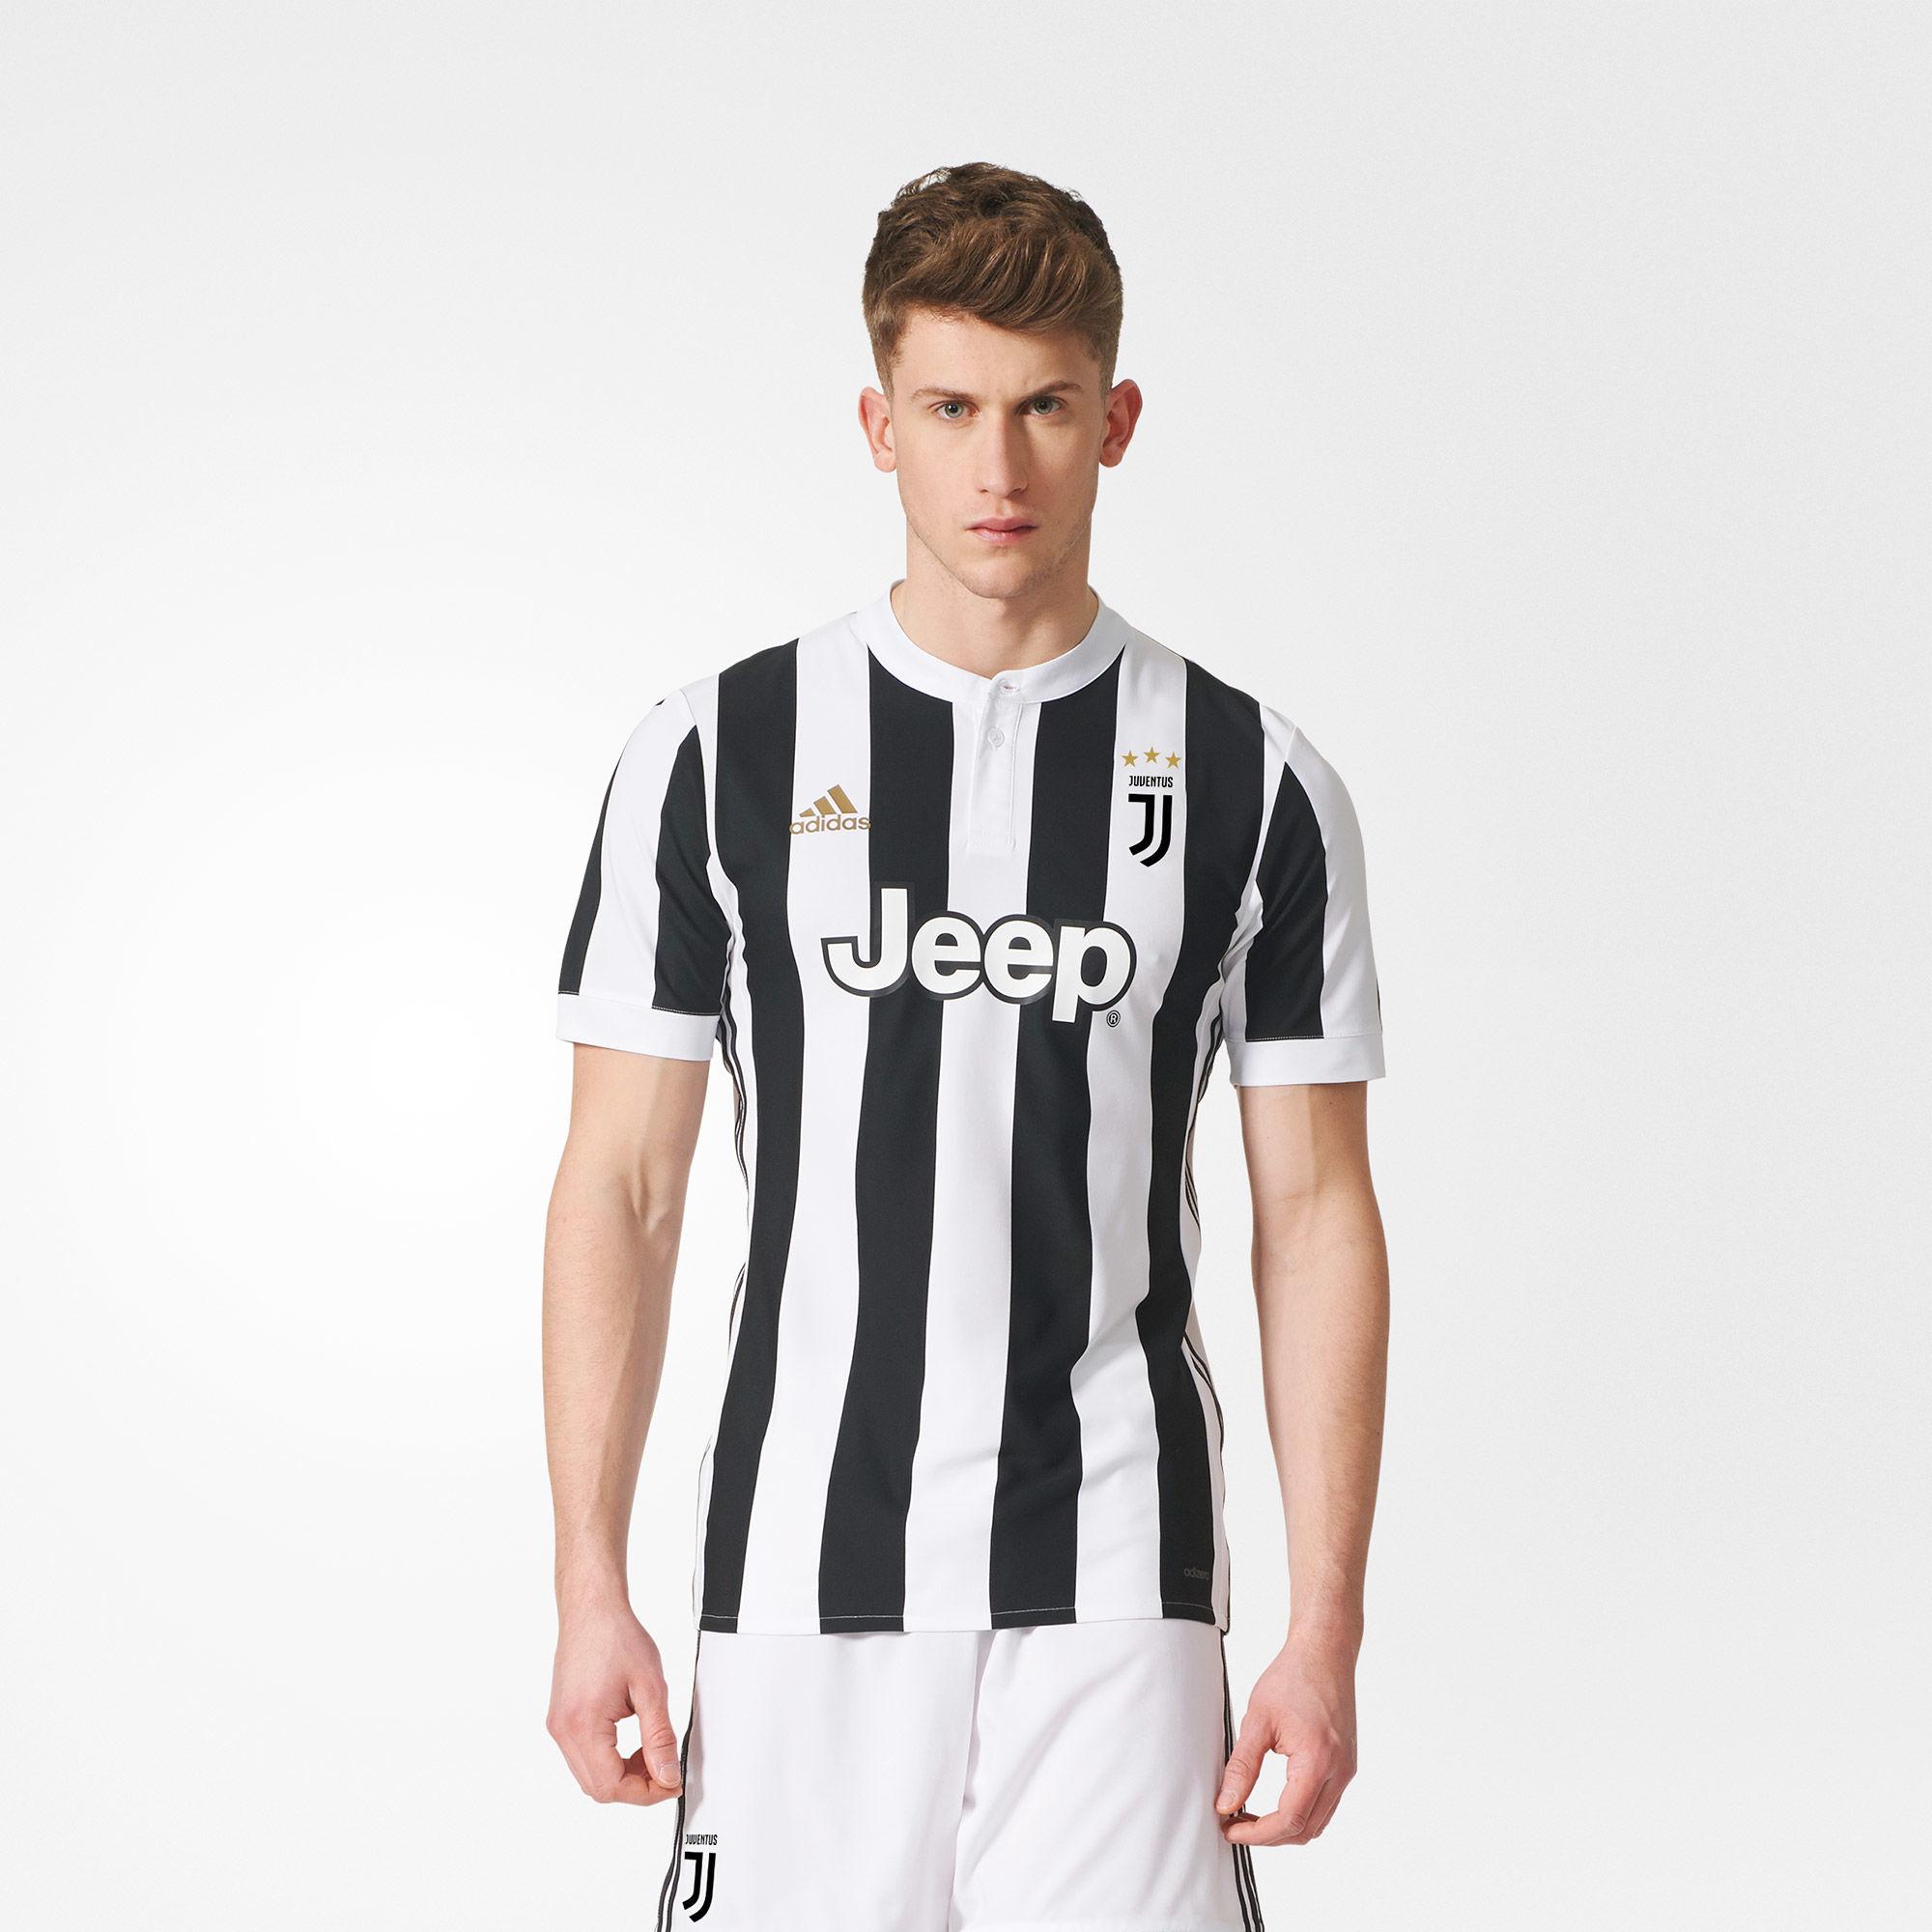 Juventus 2017-18 Adidas Home Kit | 17/18 Kits | Football ...